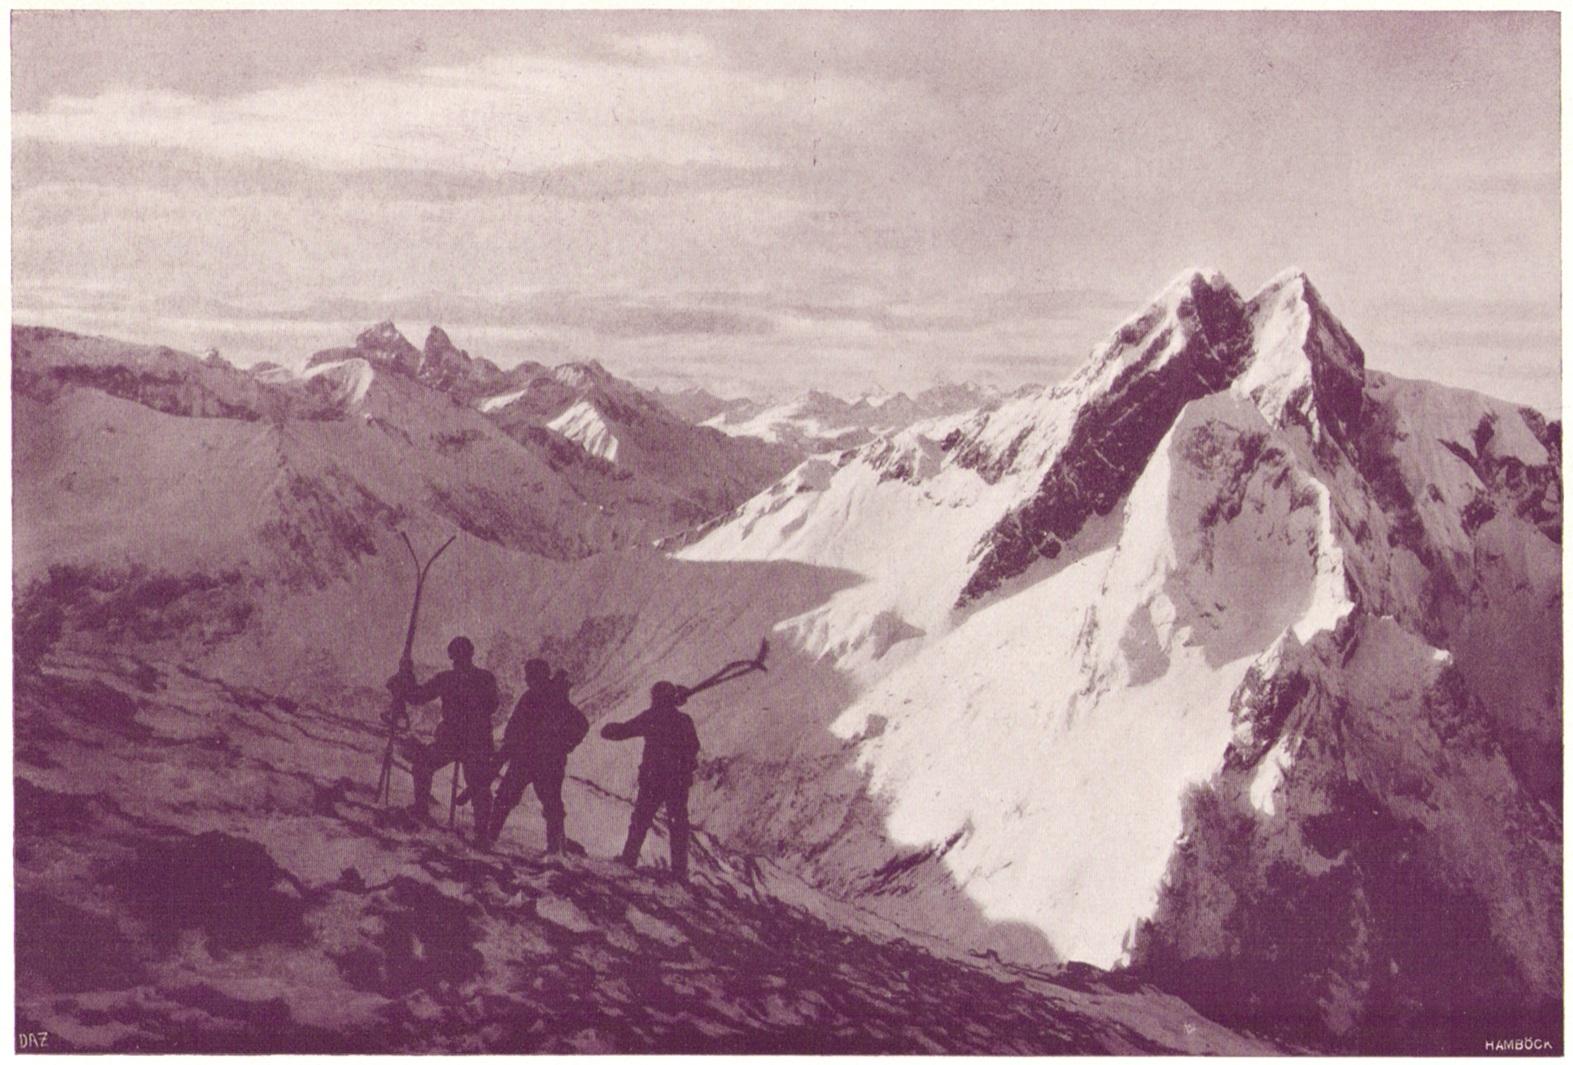 Hoefats im Winter vom Himmeleck um 1900p.jpg